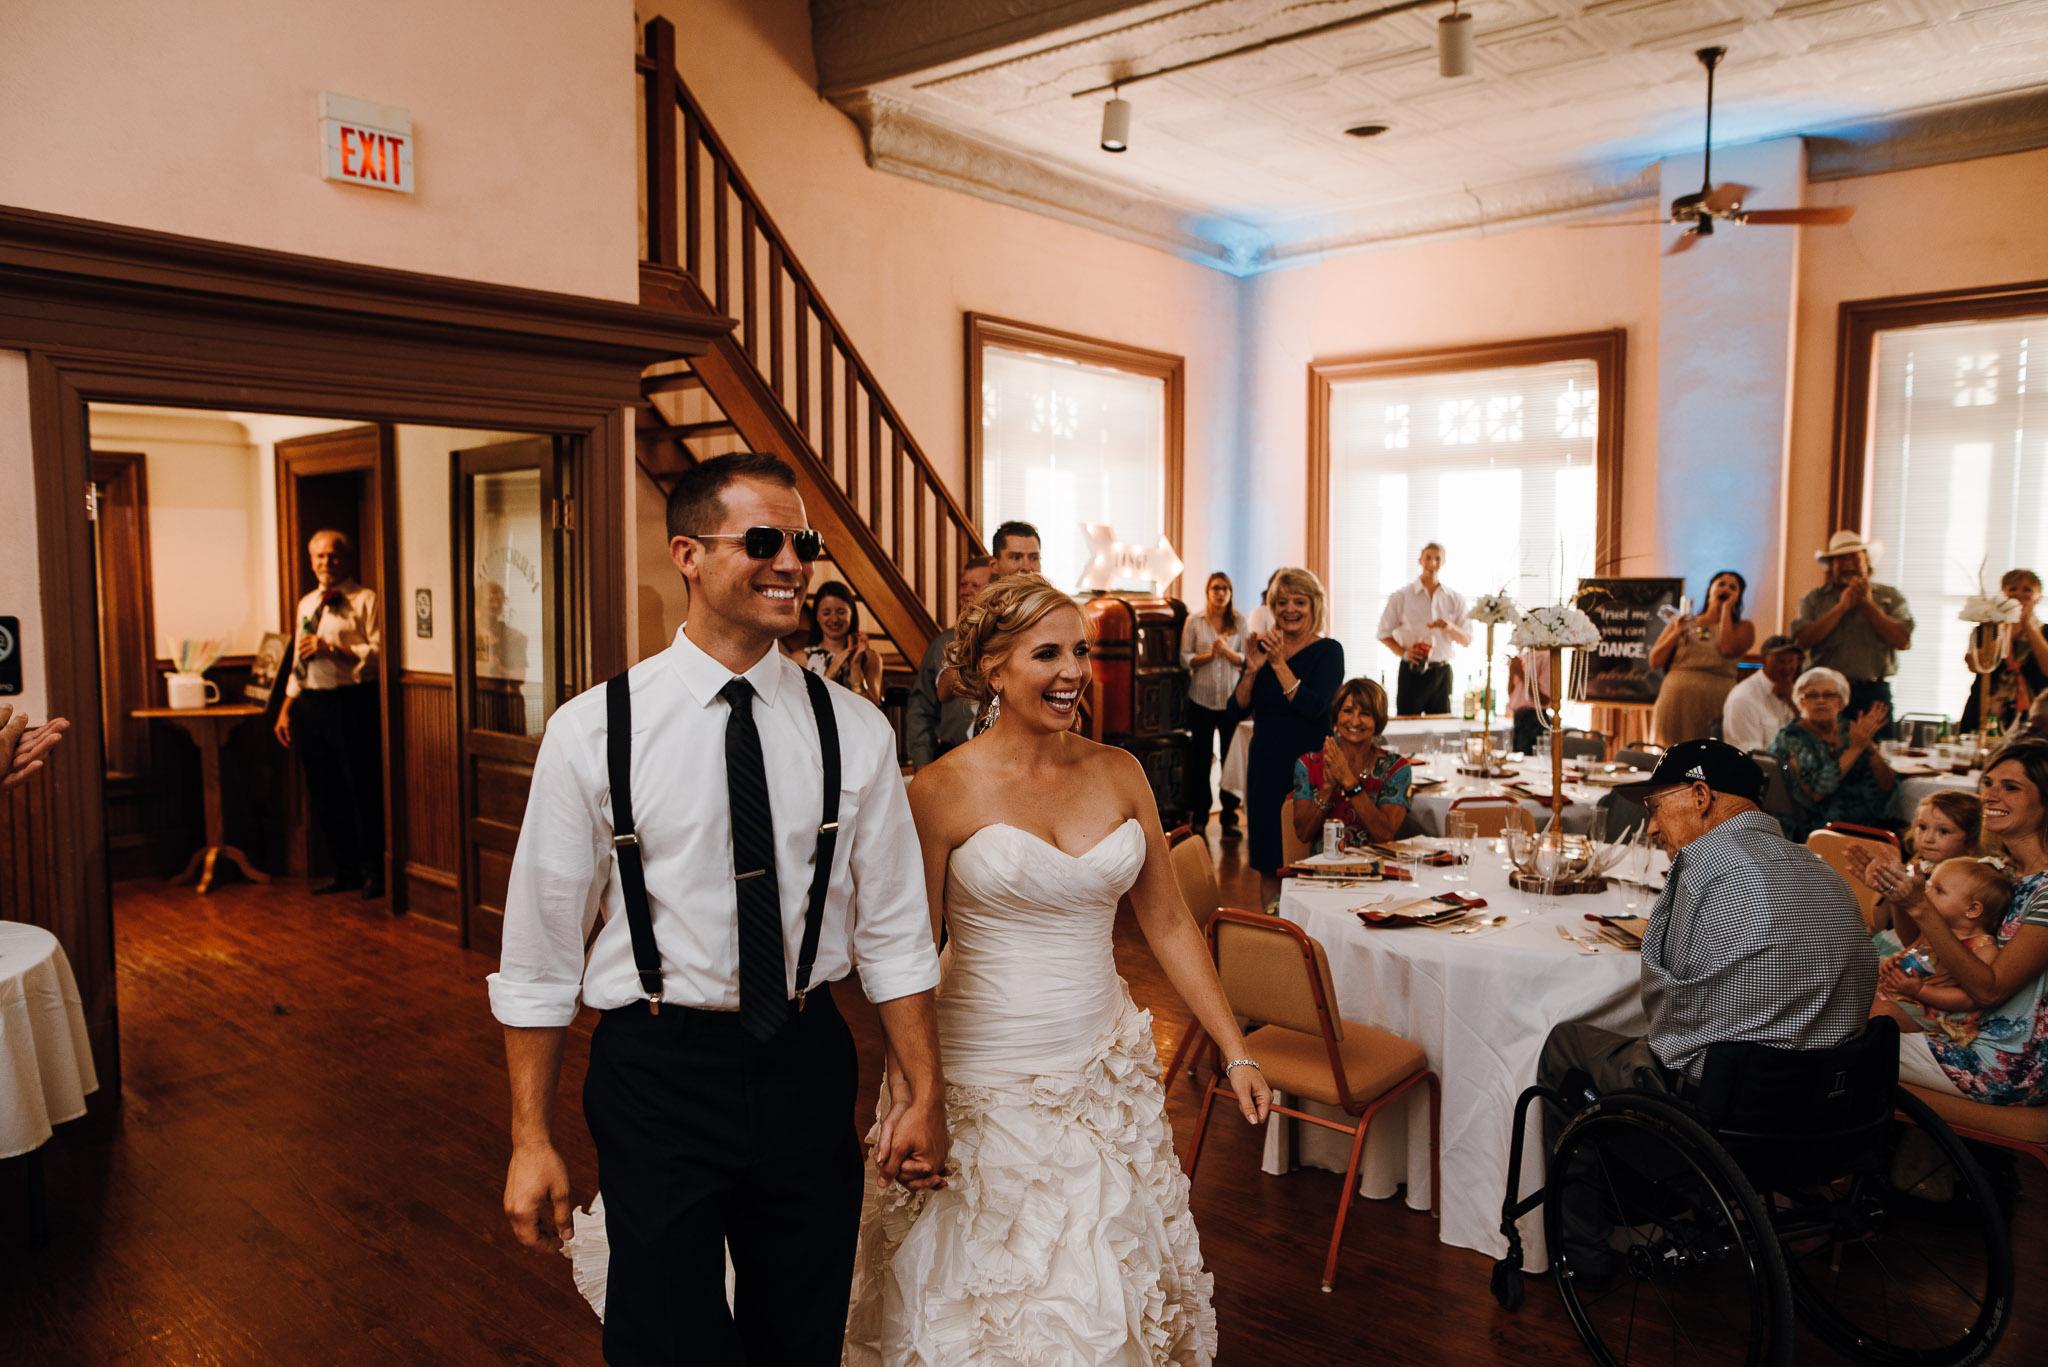 Rowena-West-Texas-Wedding-Photographer-Gillian&Ryan-0037.jpg